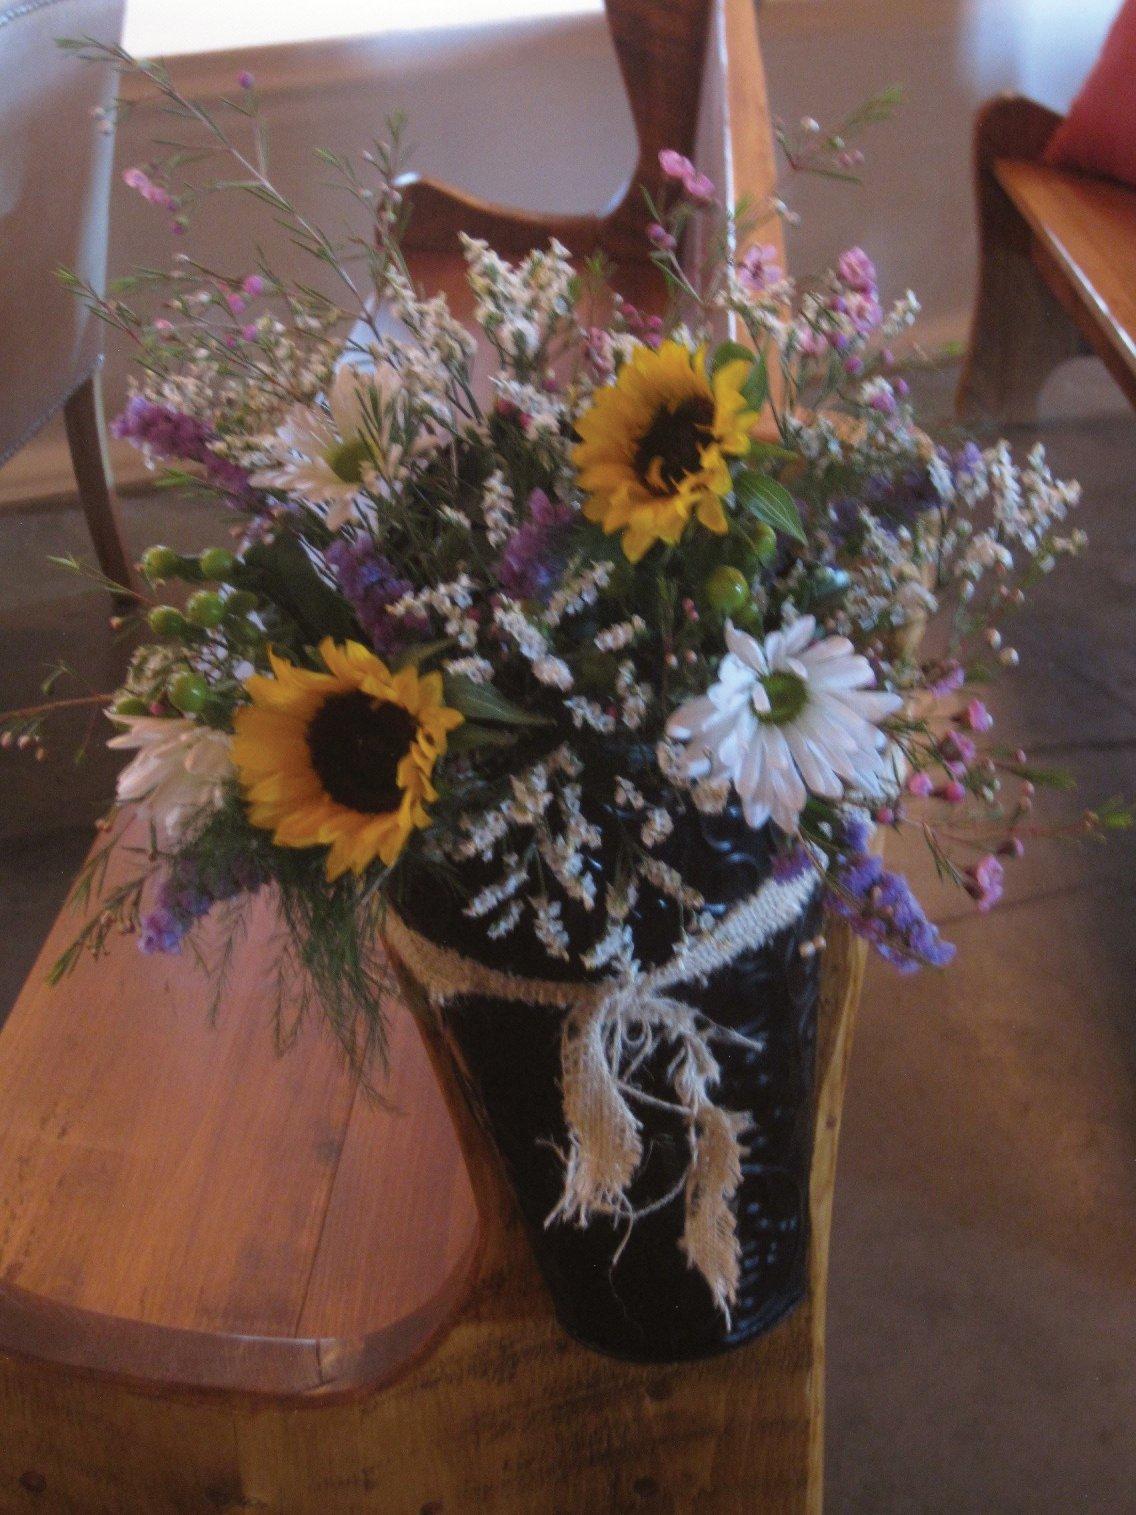 Discontinued flower decor